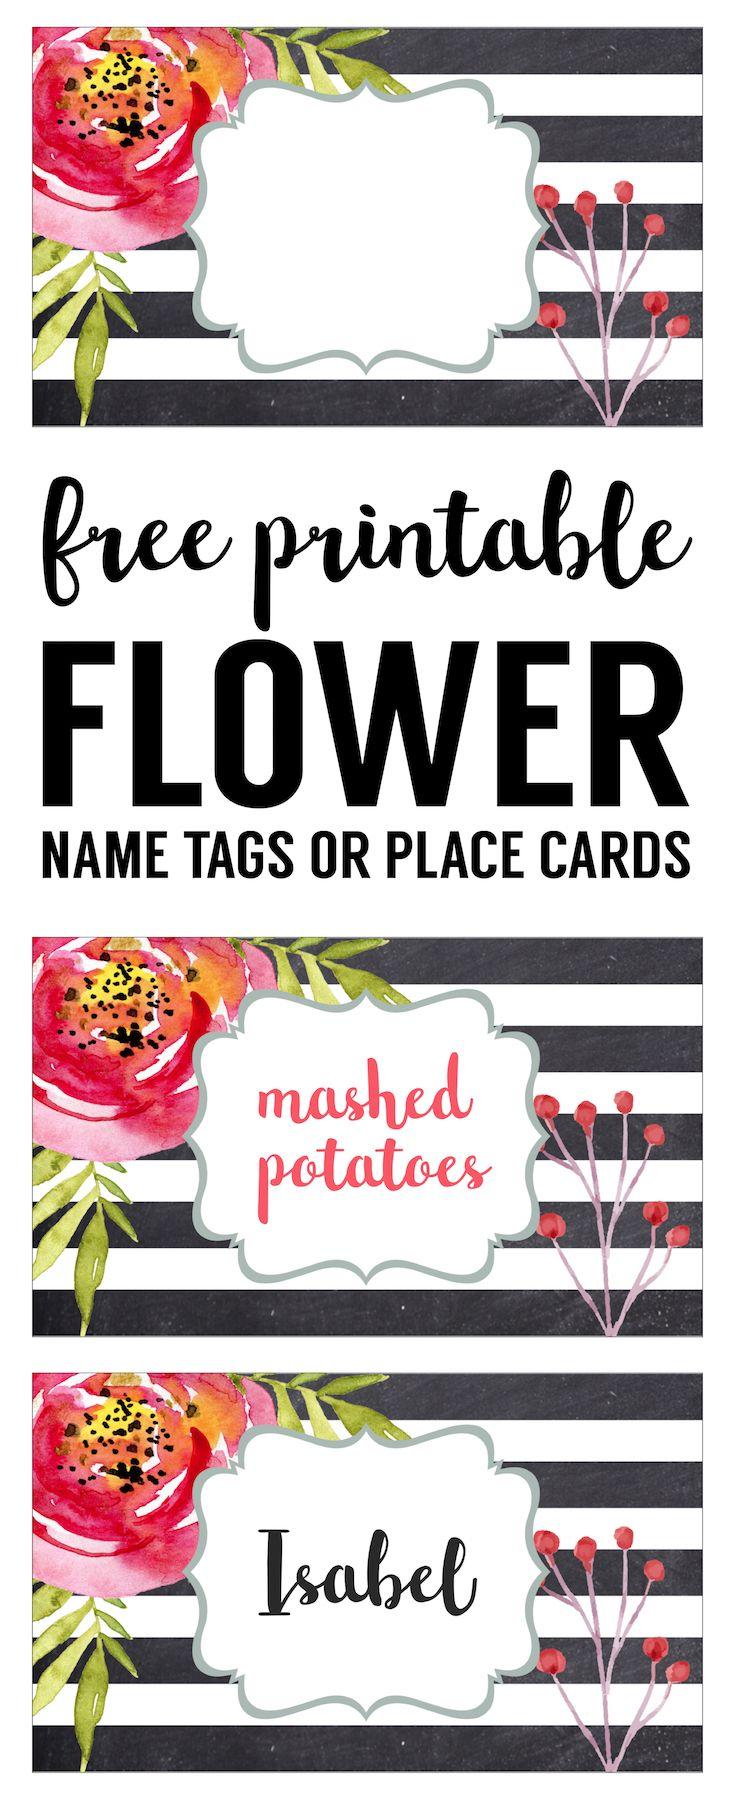 Flower Place Card Holder or Food Labels Free Printable